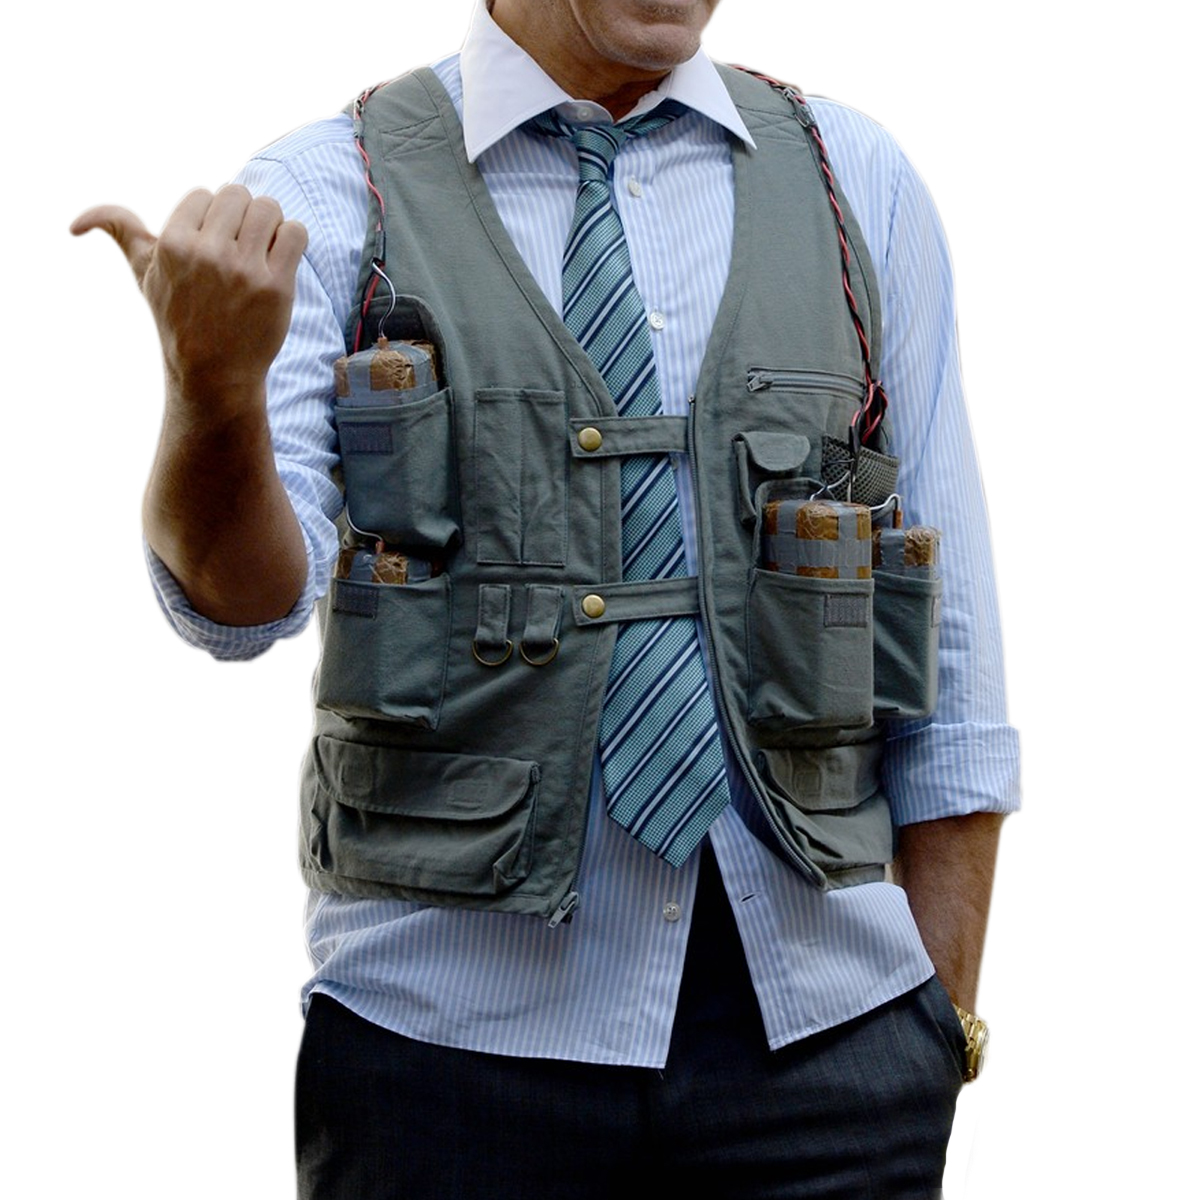 george clooney suicide vest money monster jacket